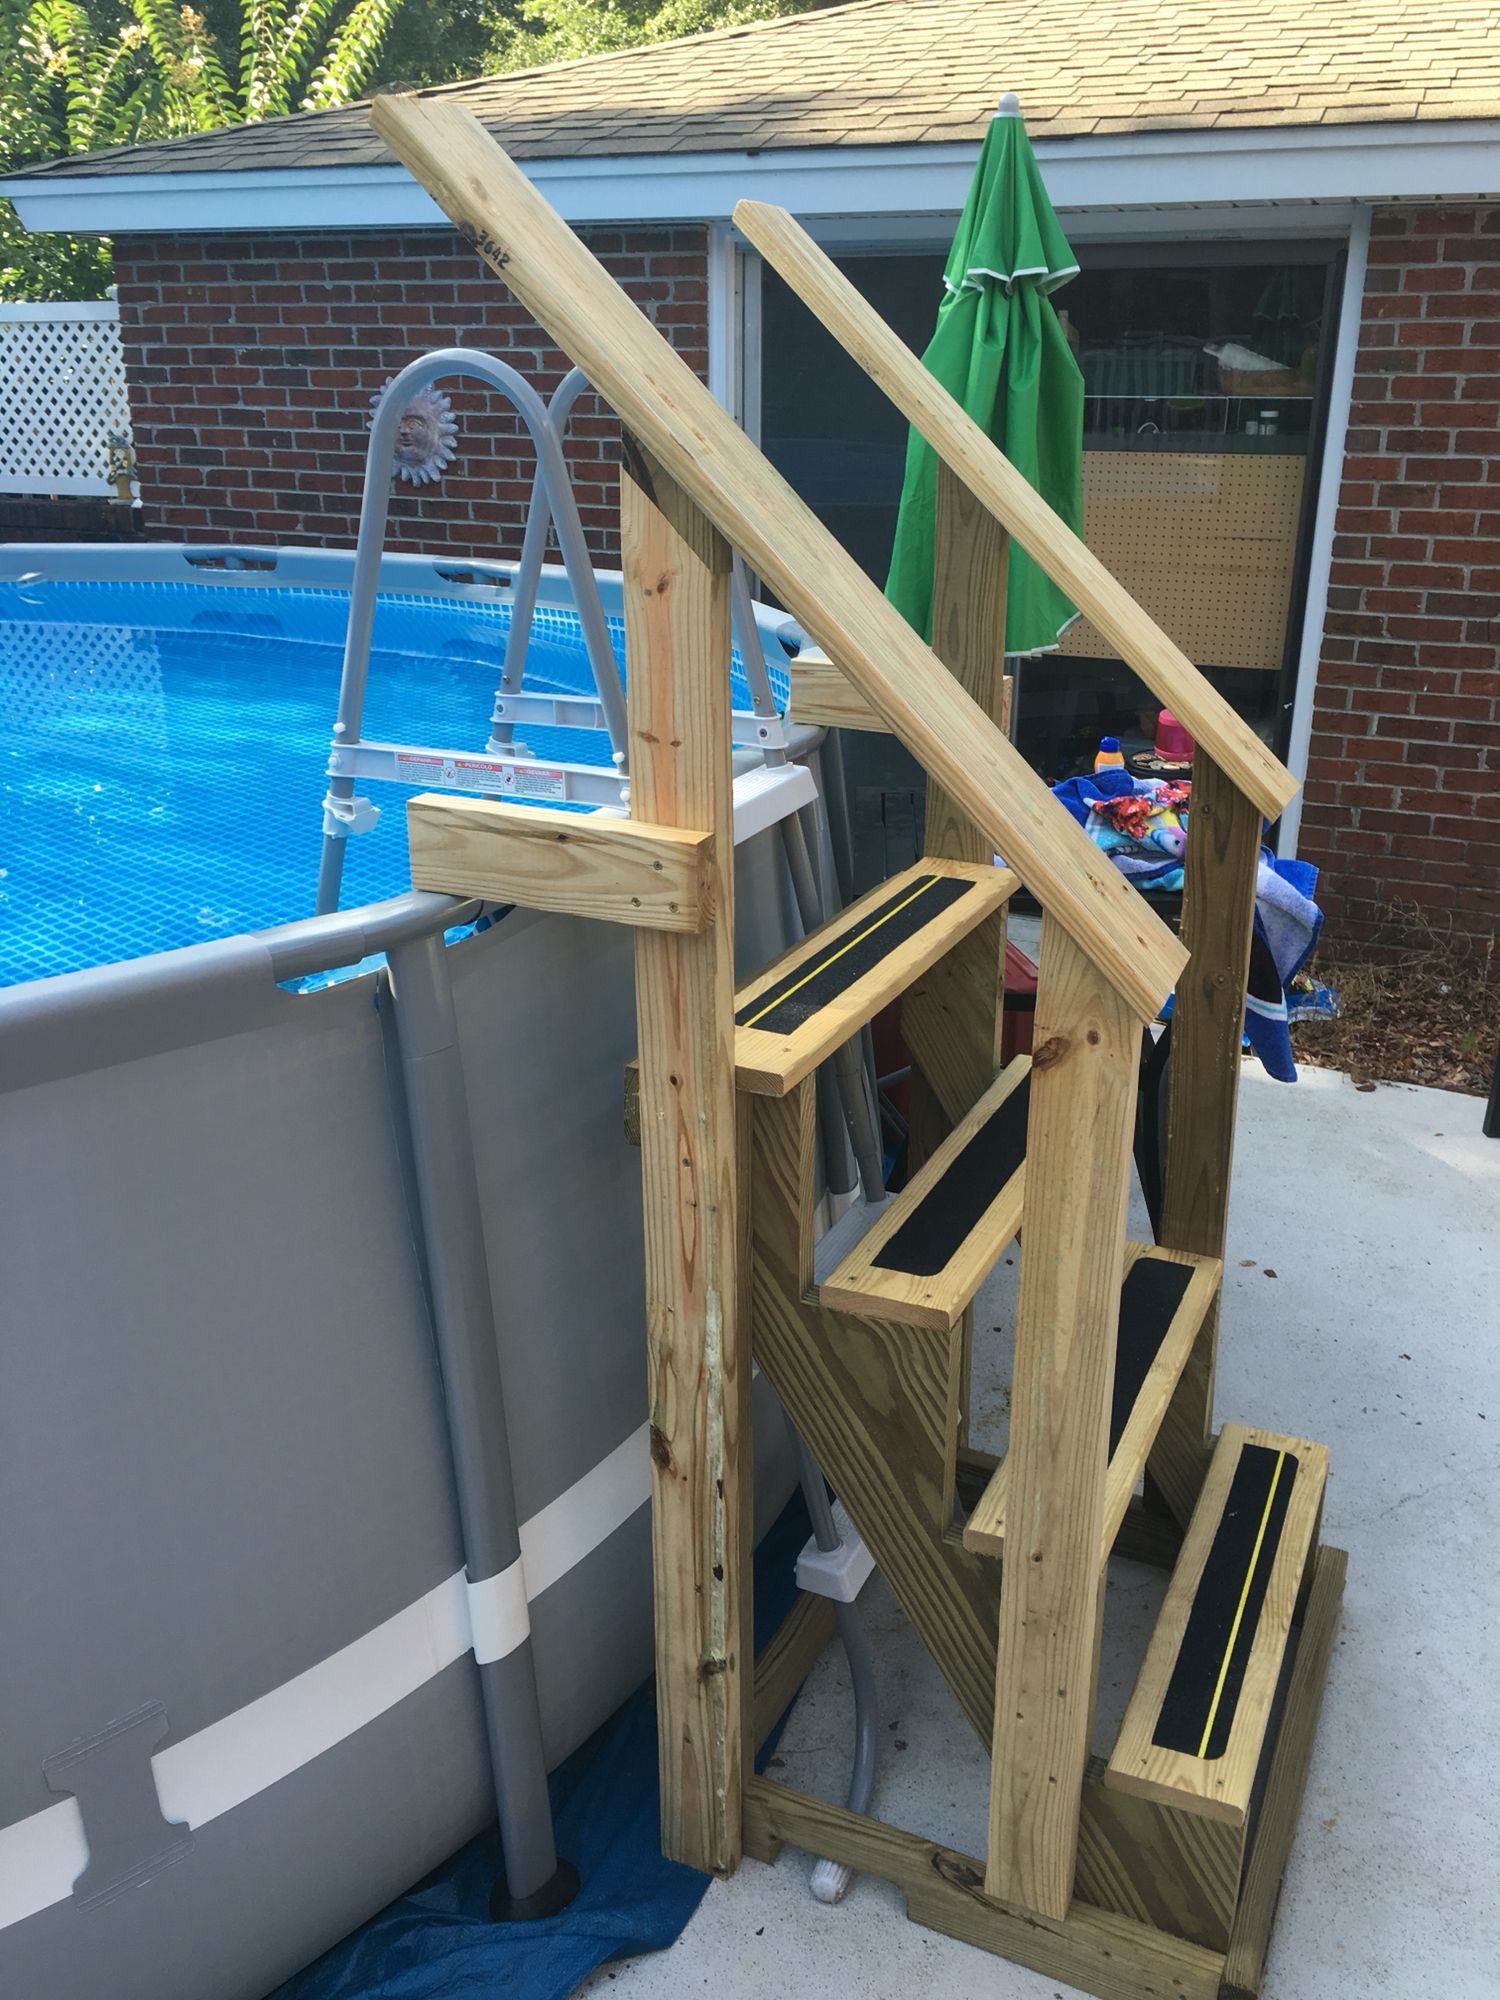 Above Ground Pool Ladder. Home Improvements Landscaping Decks